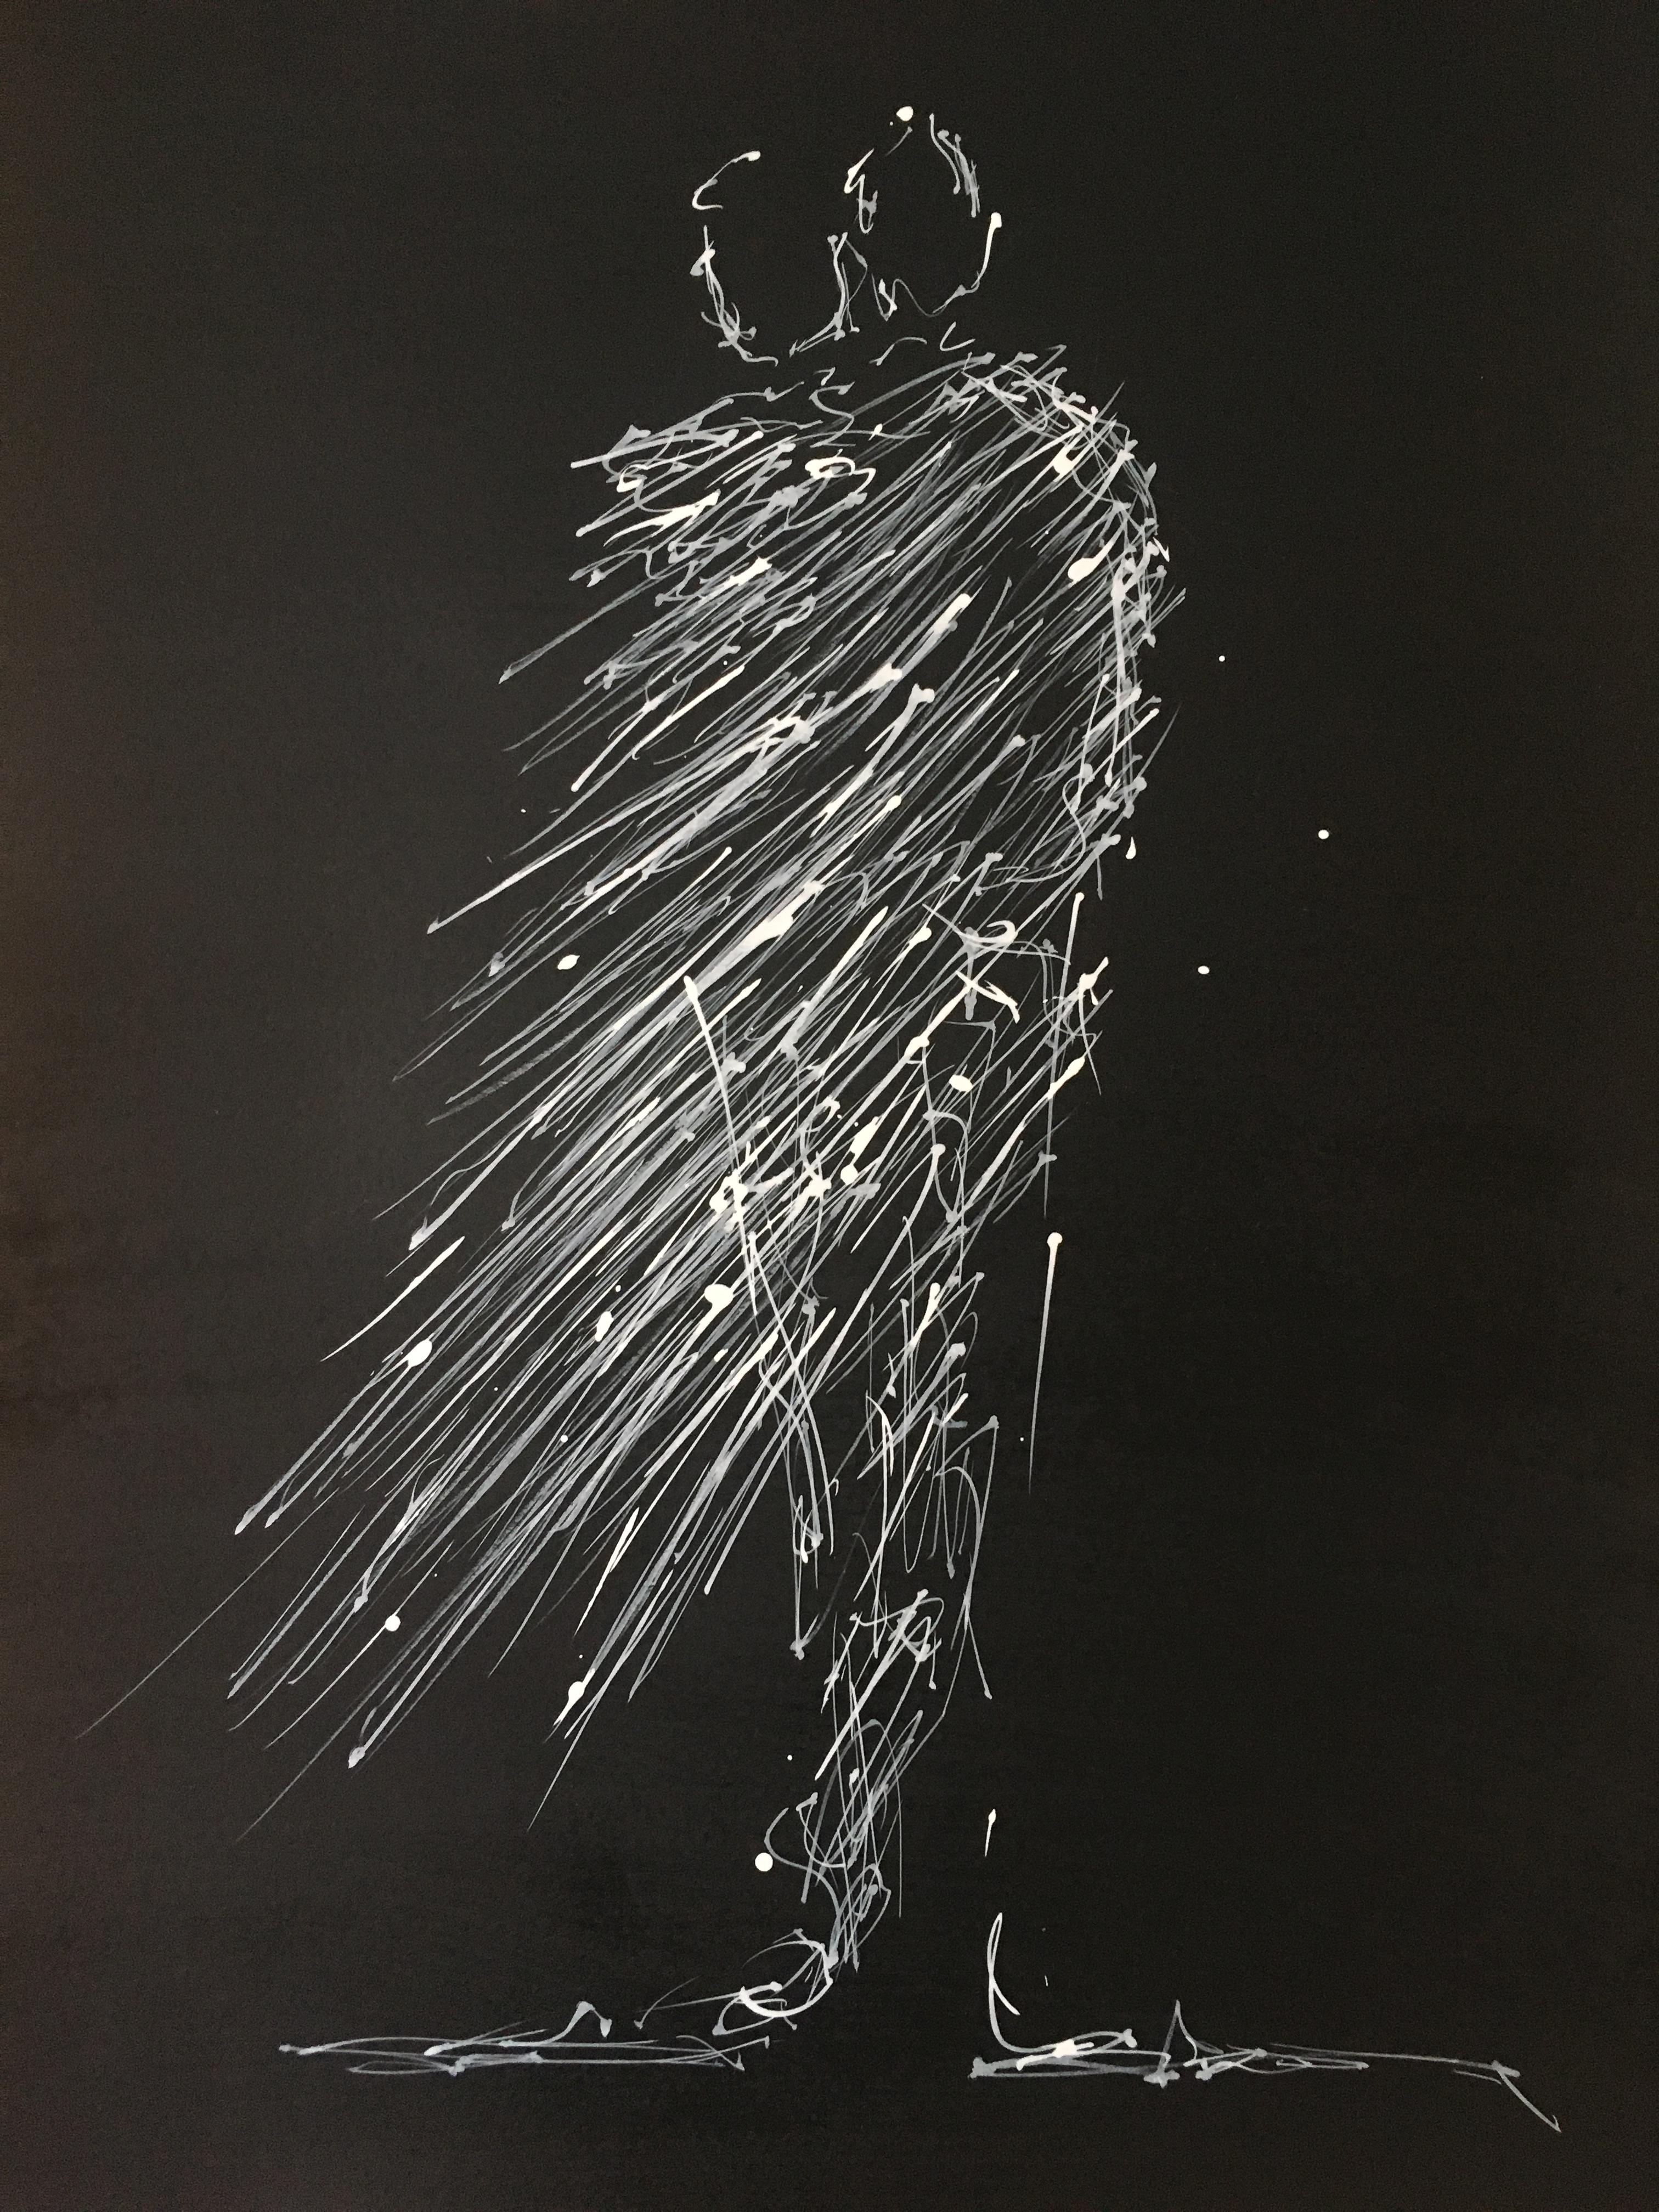 Untitled 1 - Farzad Kohan